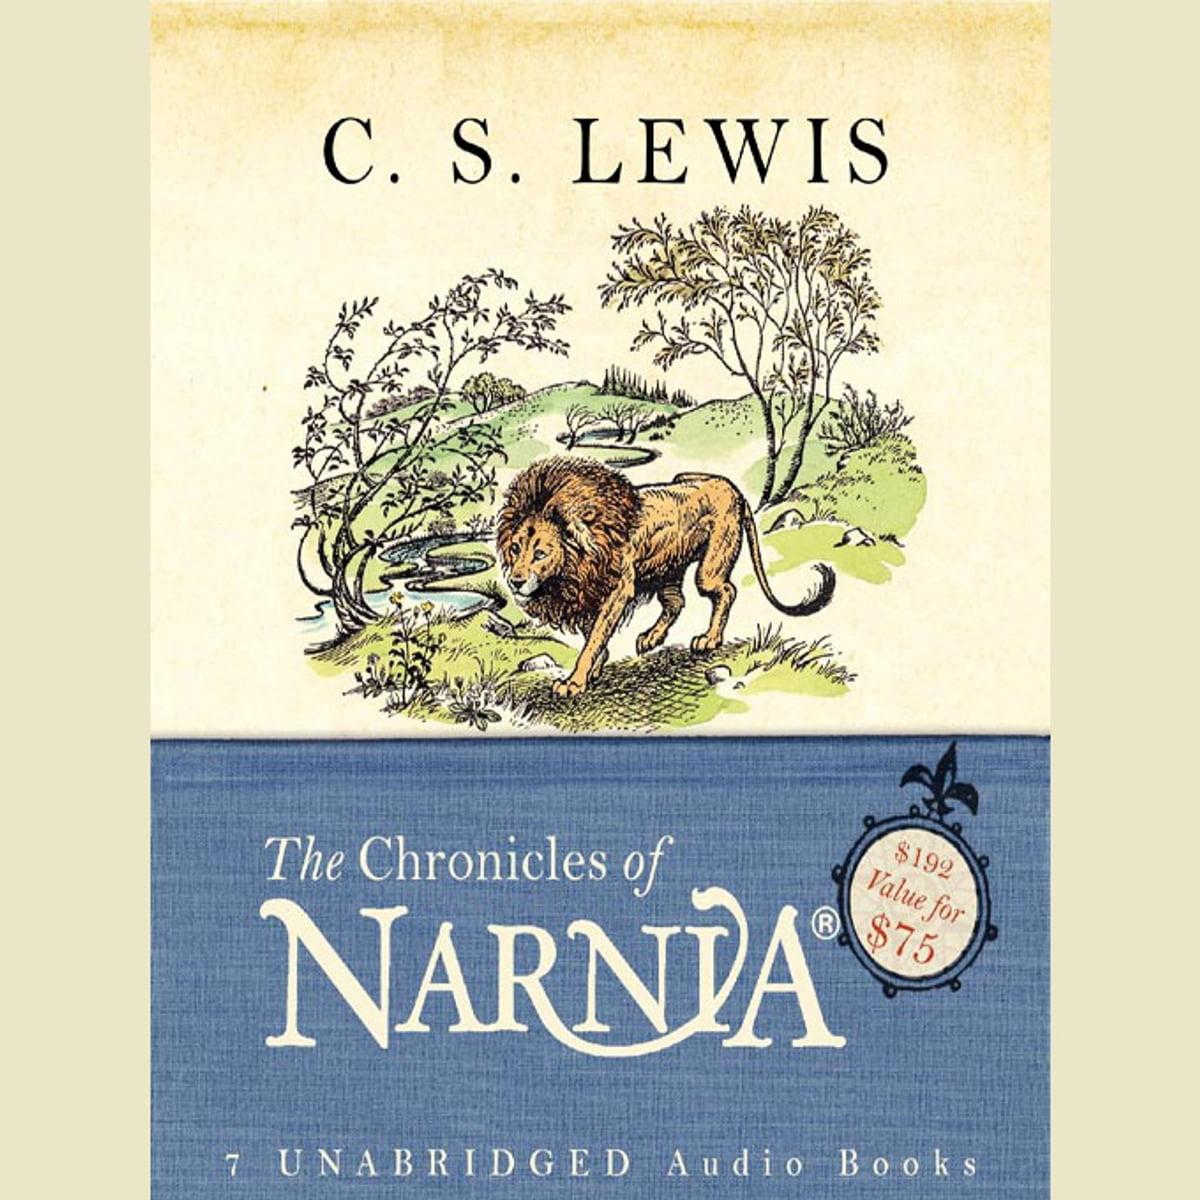 The Chronicles of Narnia Adult Box Set Audiobook by C. S. Lewis - 9780061999888   Rakuten Kobo